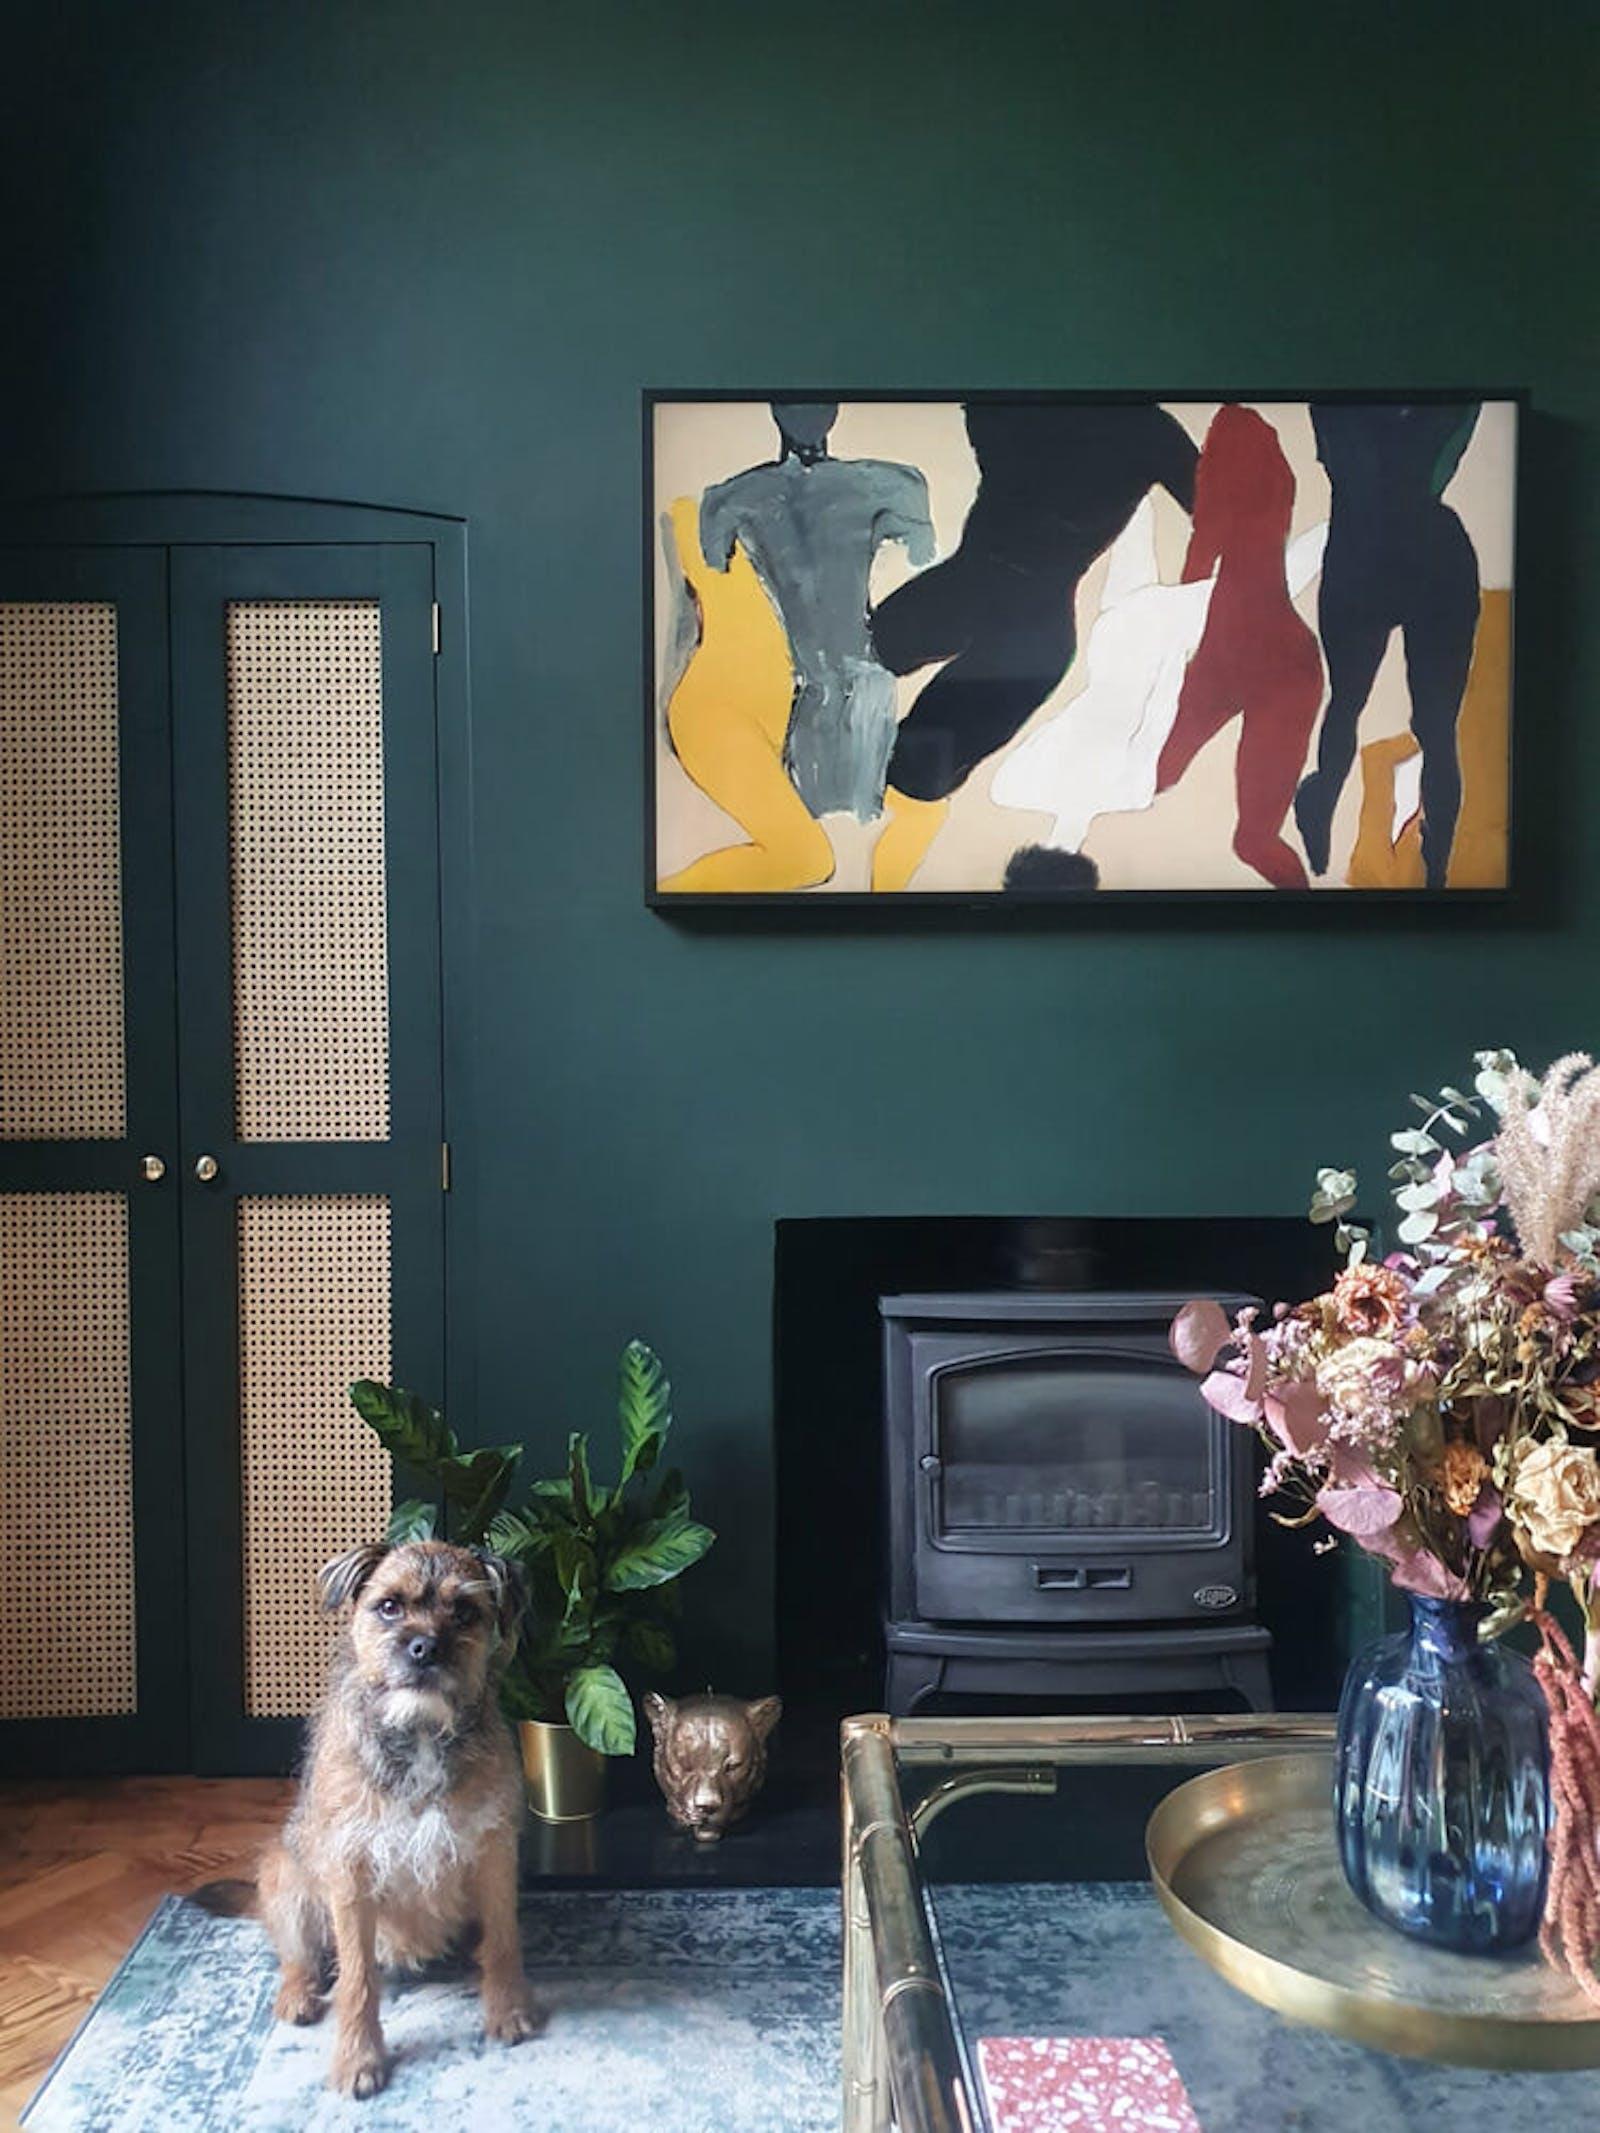 Living room dark green walls and stylish artwork